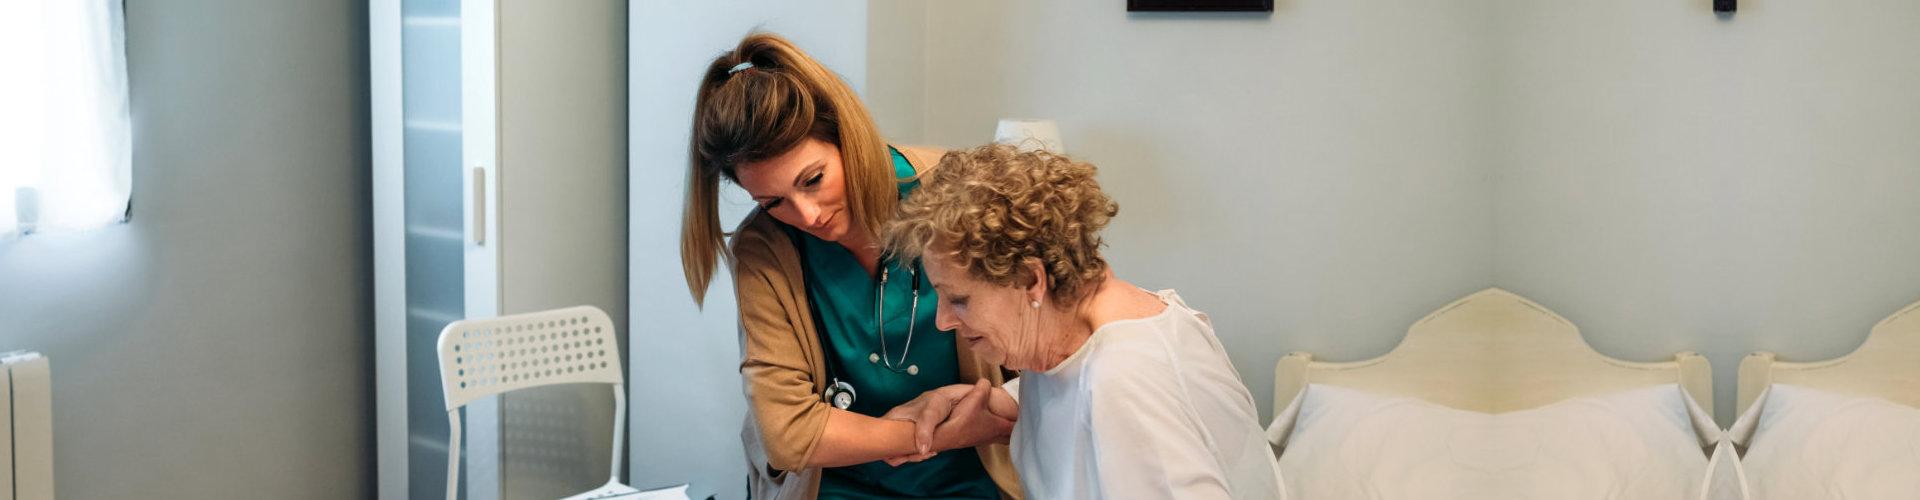 caregiver assisting elder woman on standing up